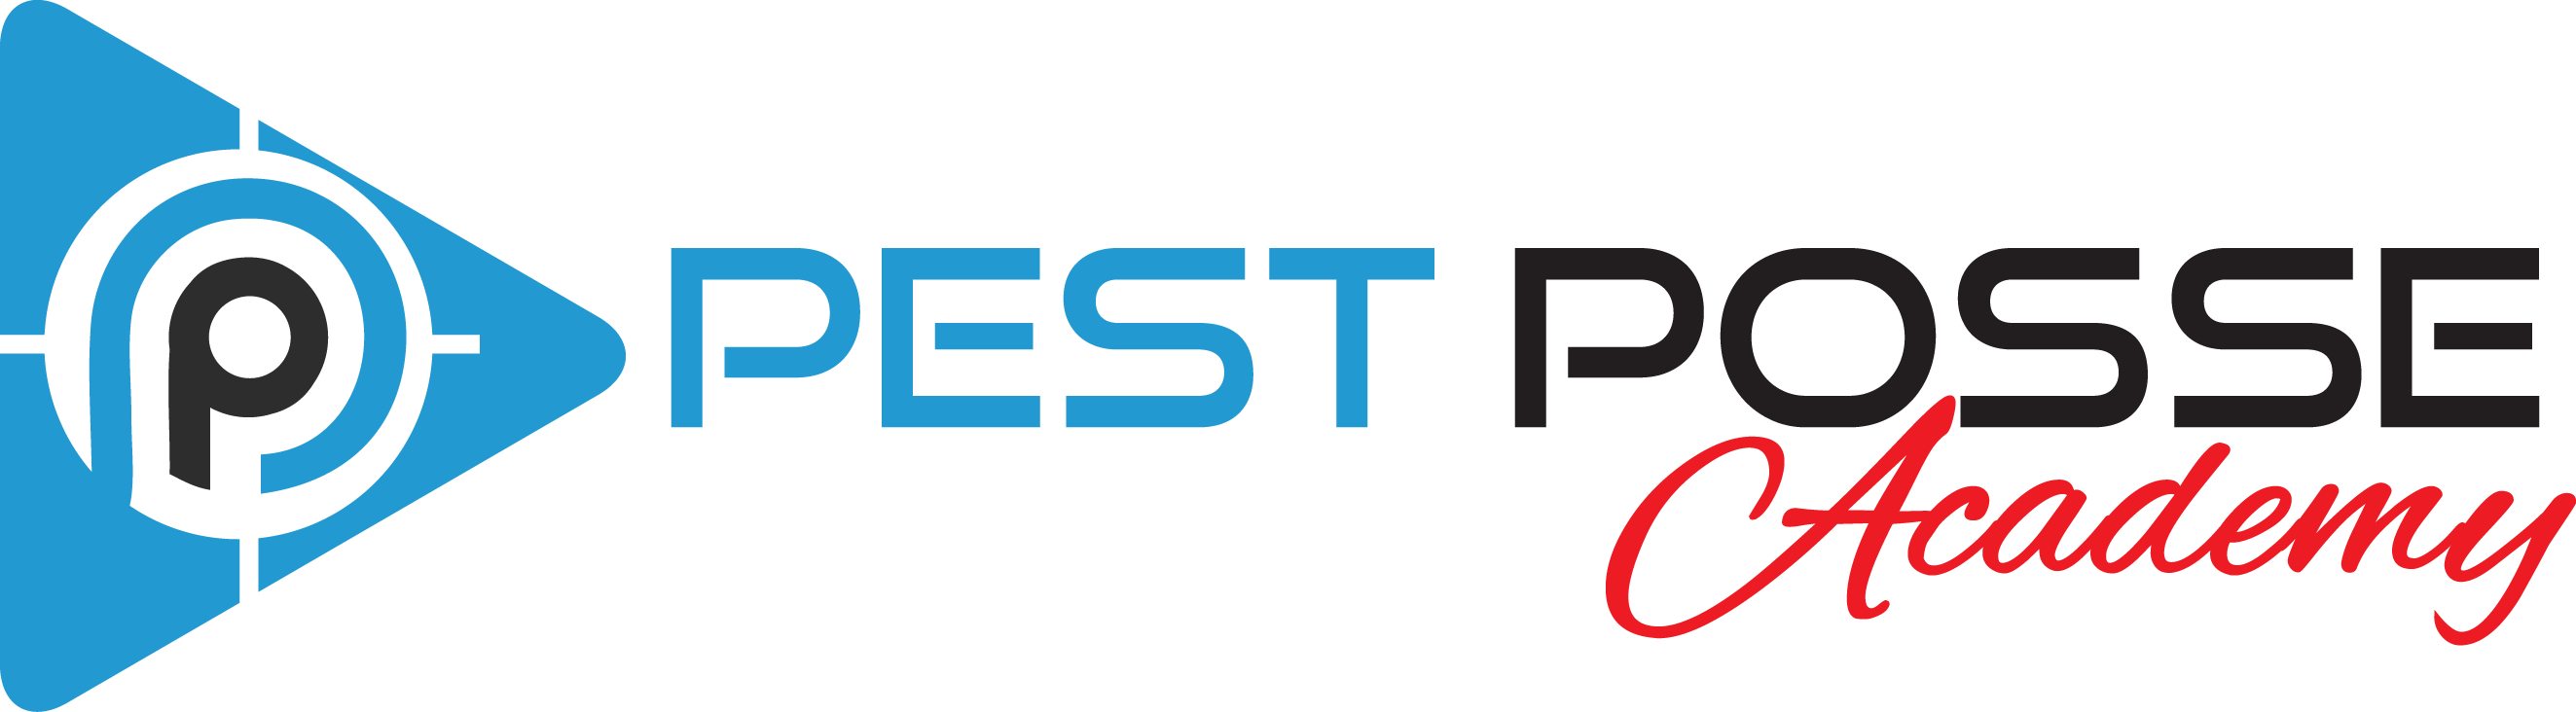 Pest Posse Academy Logo